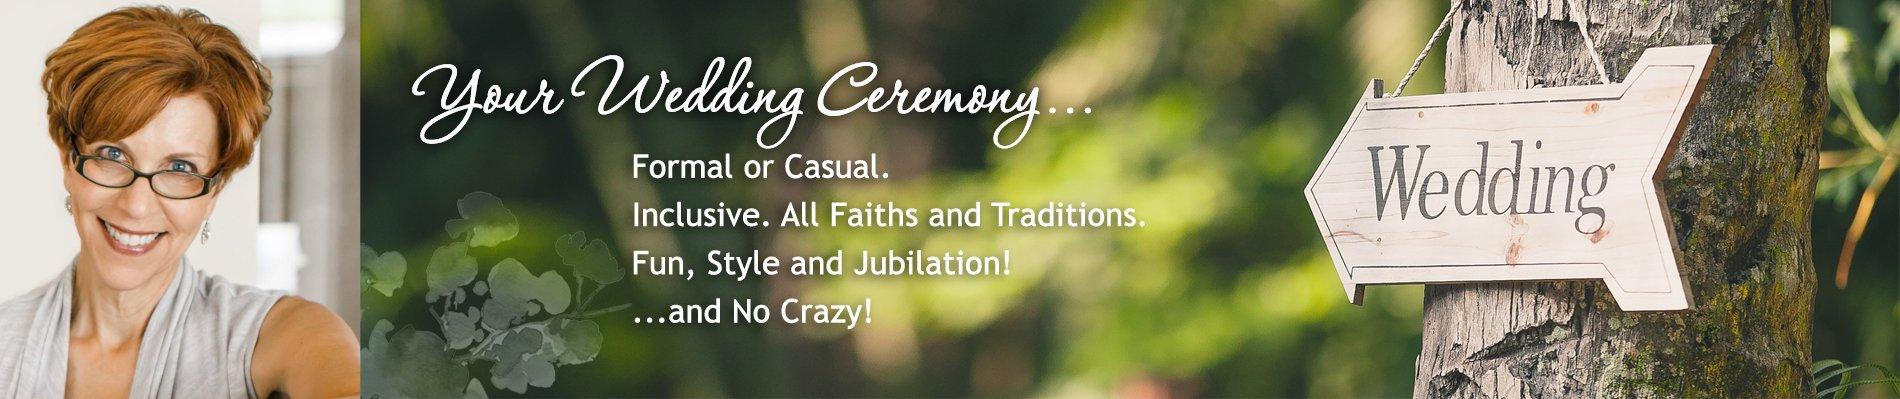 Olympia Tacoma Wedding Officiant - Annemarie Juhlian